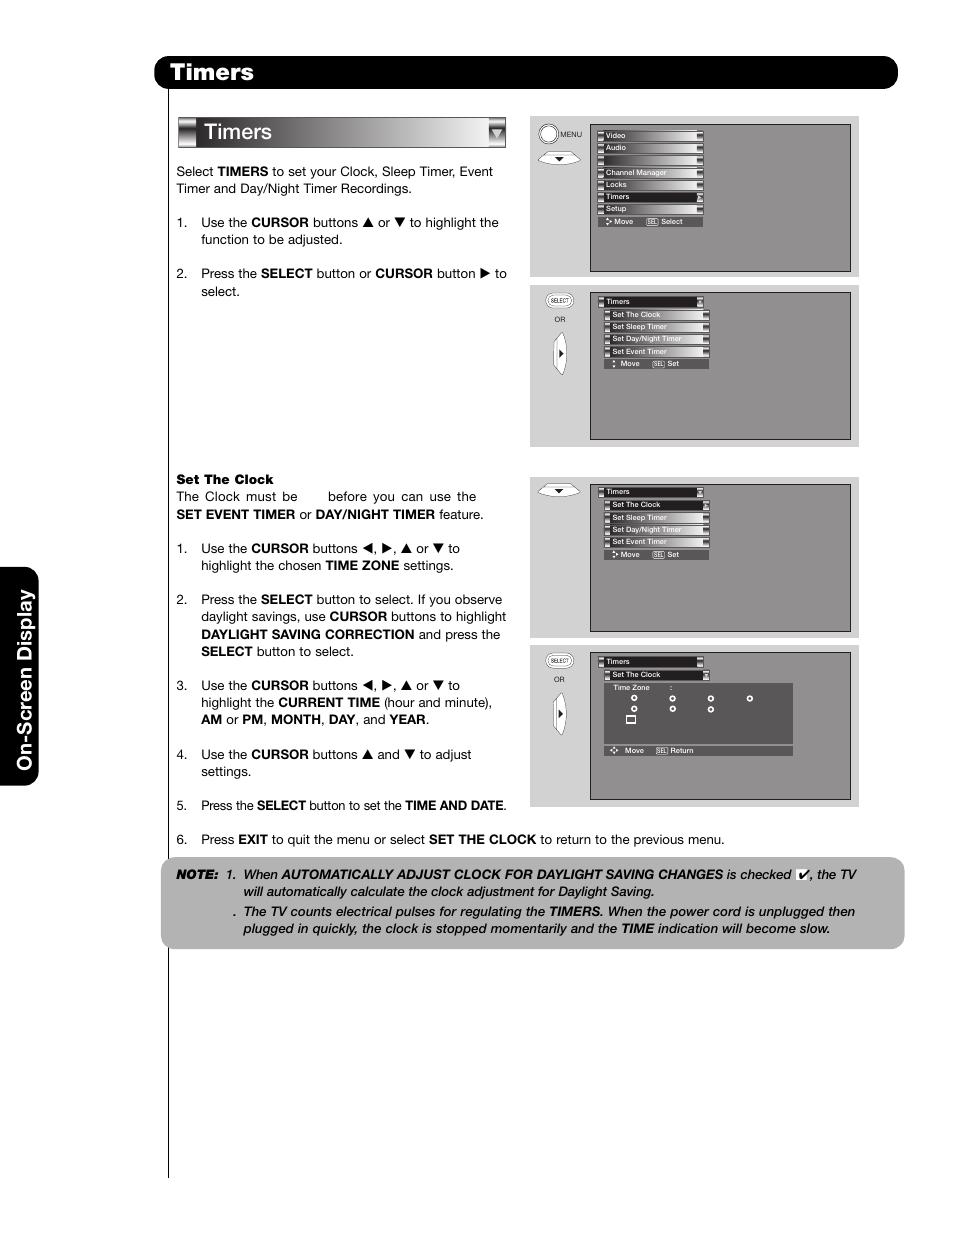 timers on scr een display hitachi 51f59 user manual page 50 75 rh manualsdir com Hitachi Rear Projection TV 51F59A Hitachi 51F59A Manual